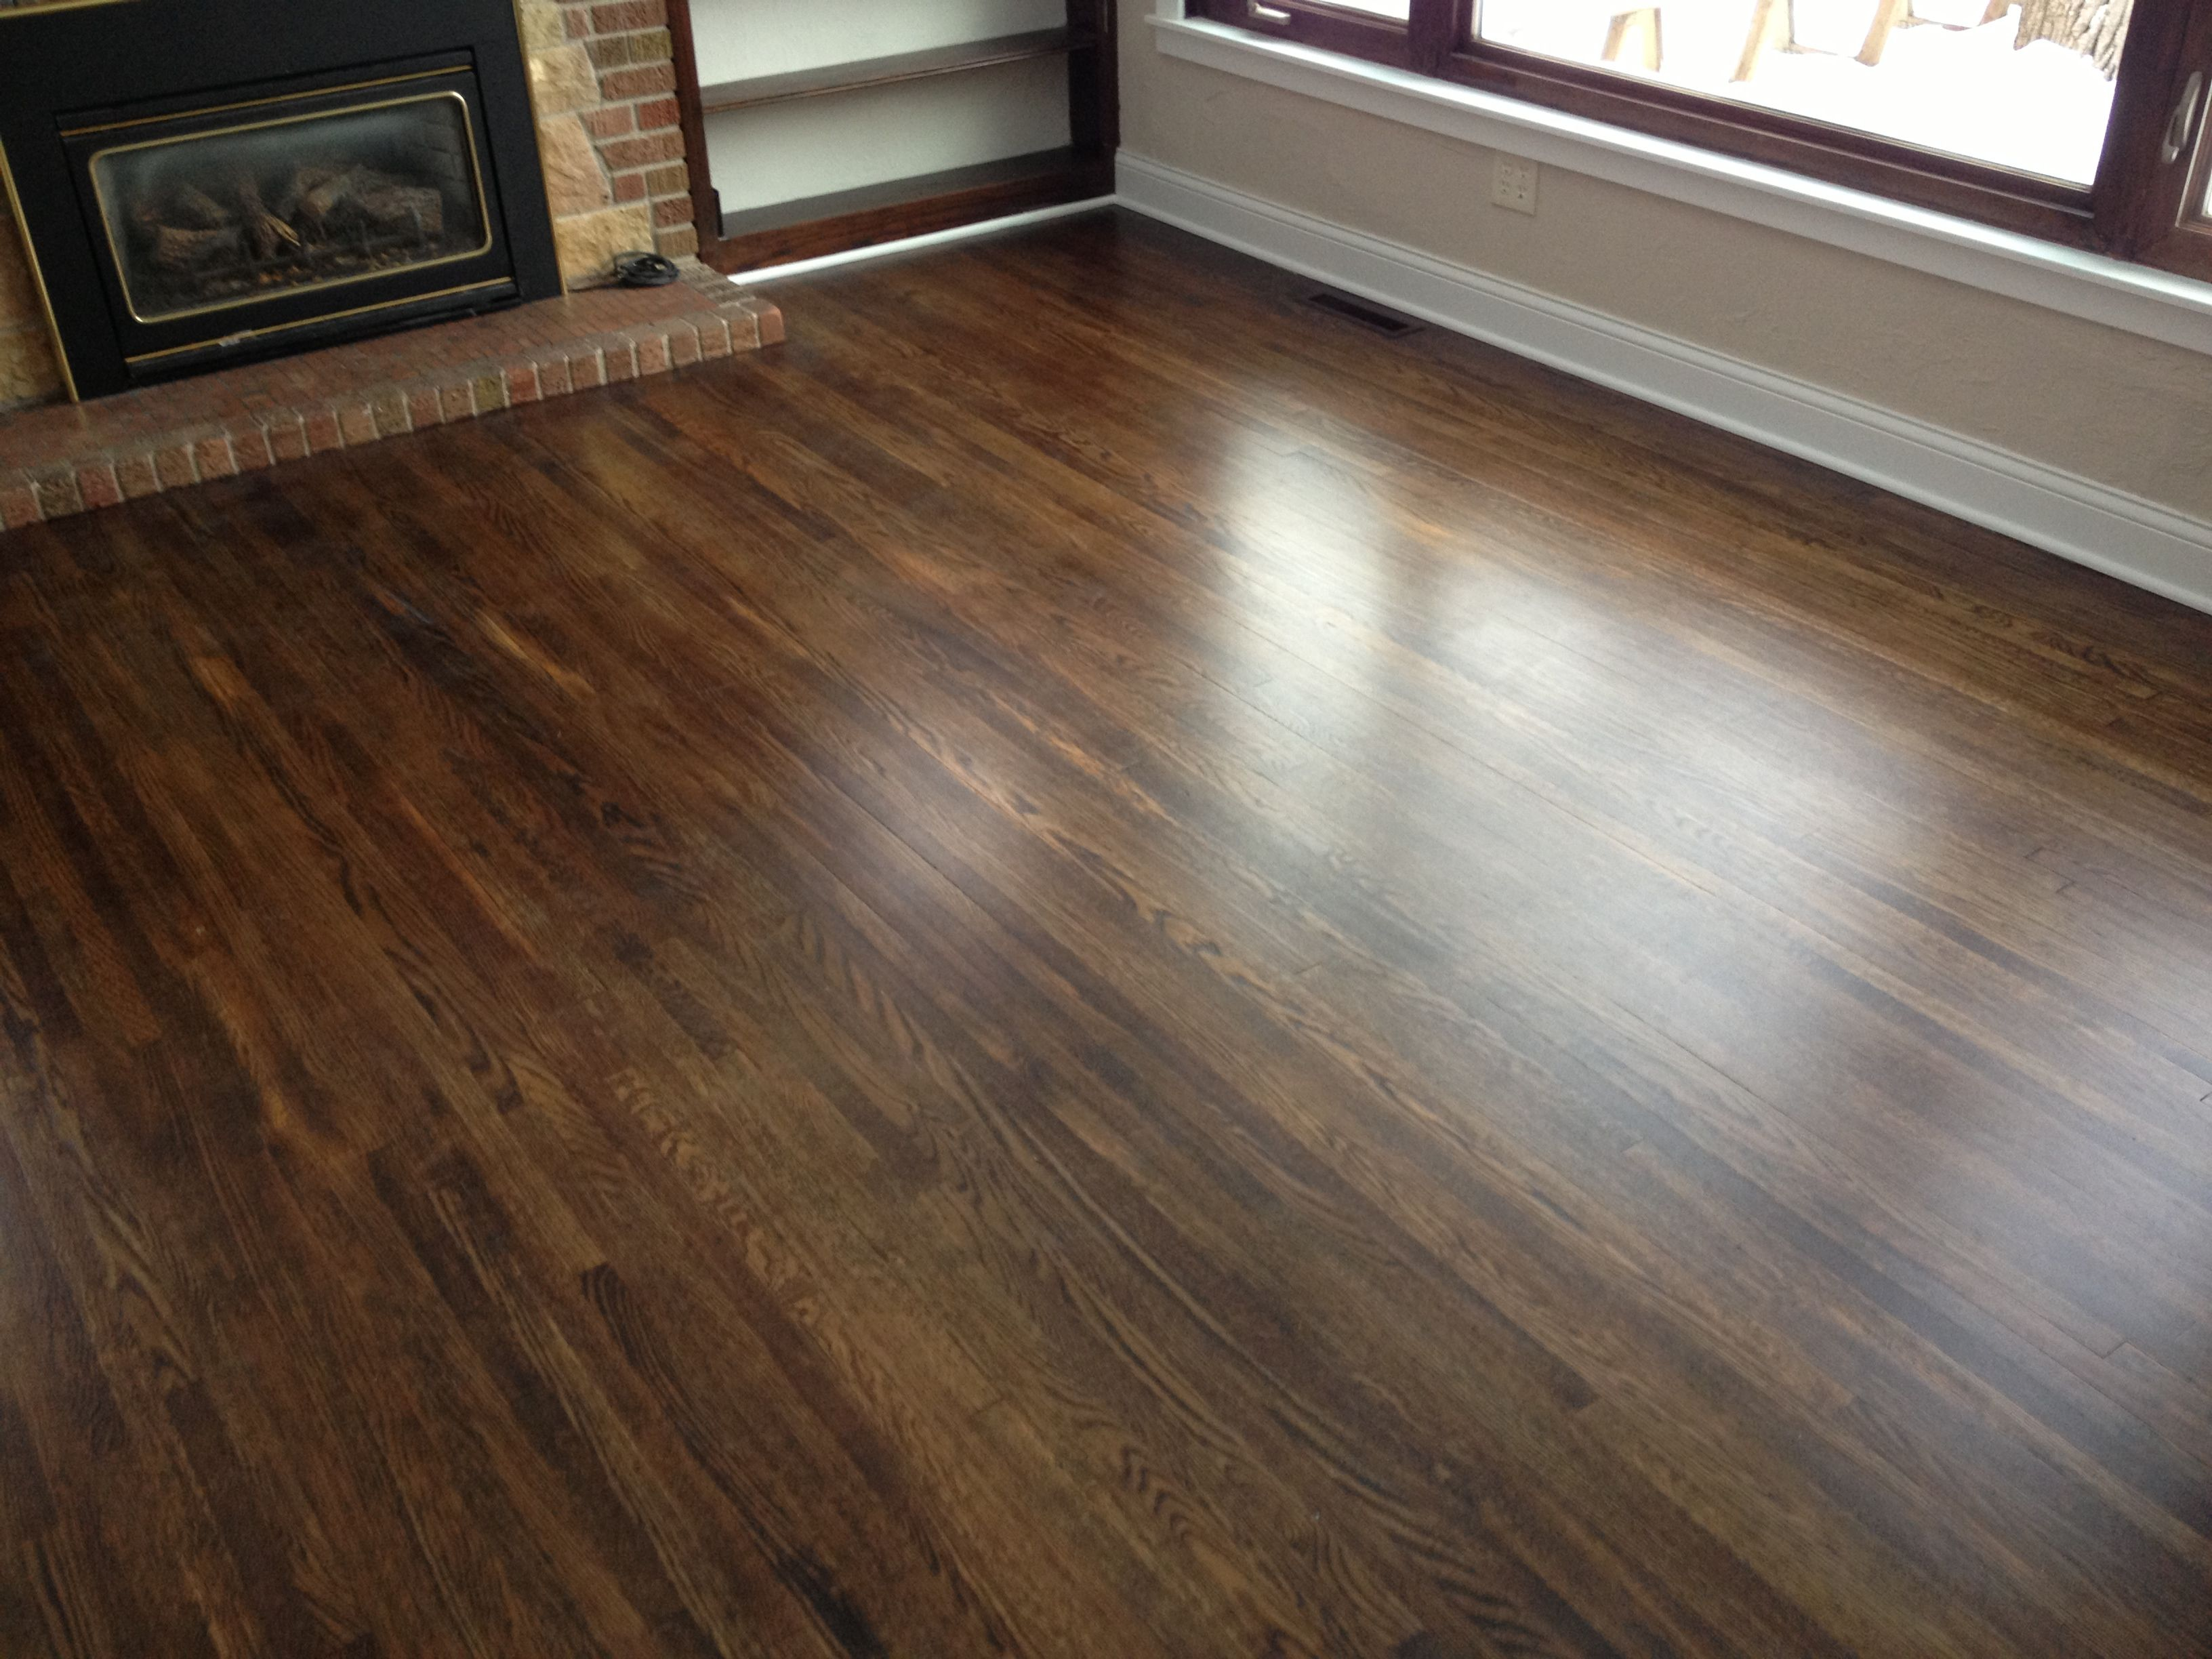 Staining hardwood floors darker minneapolis floor sanding